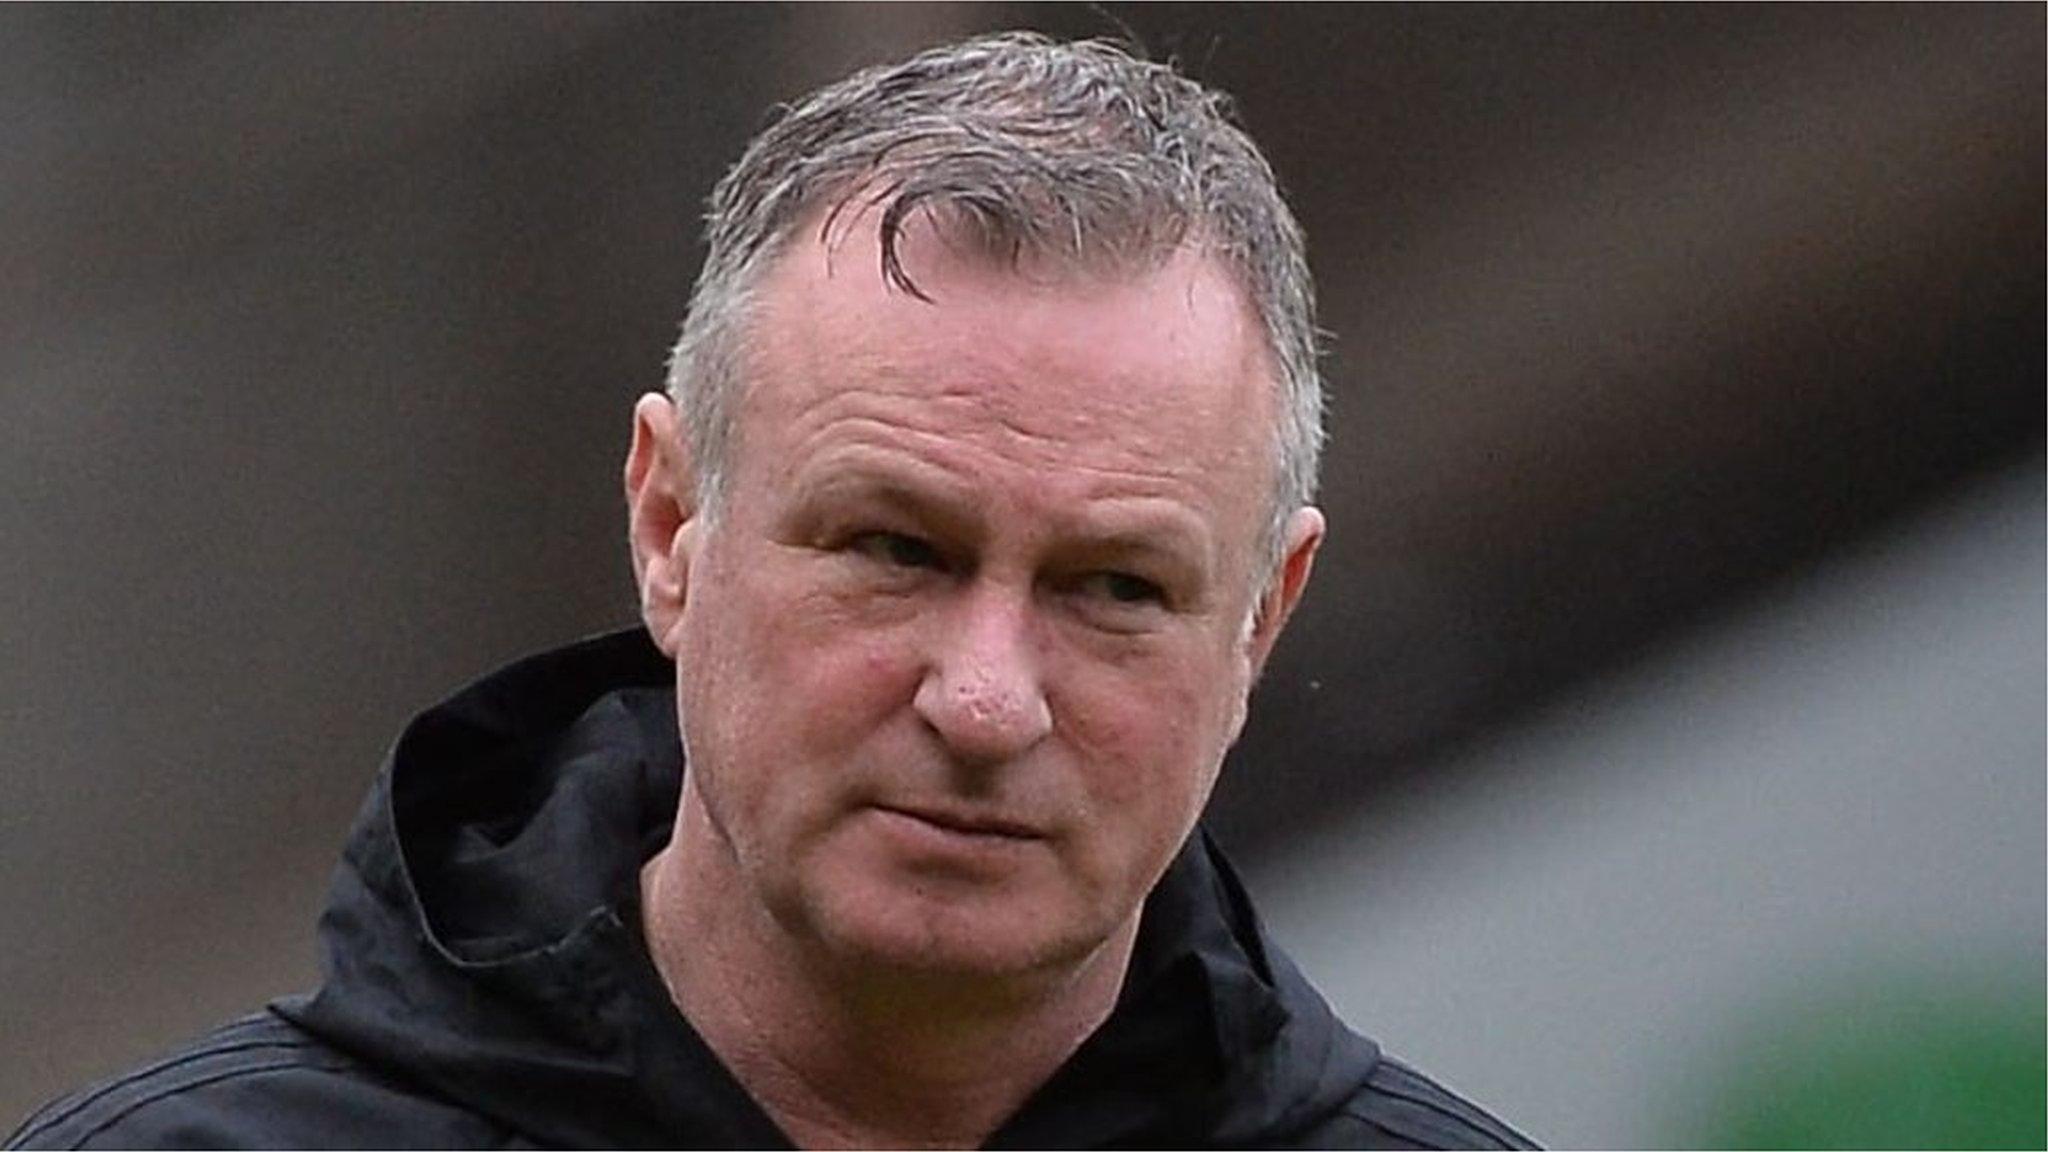 Winning start can set up NI bid for Euro 2020 spot - O'Neill